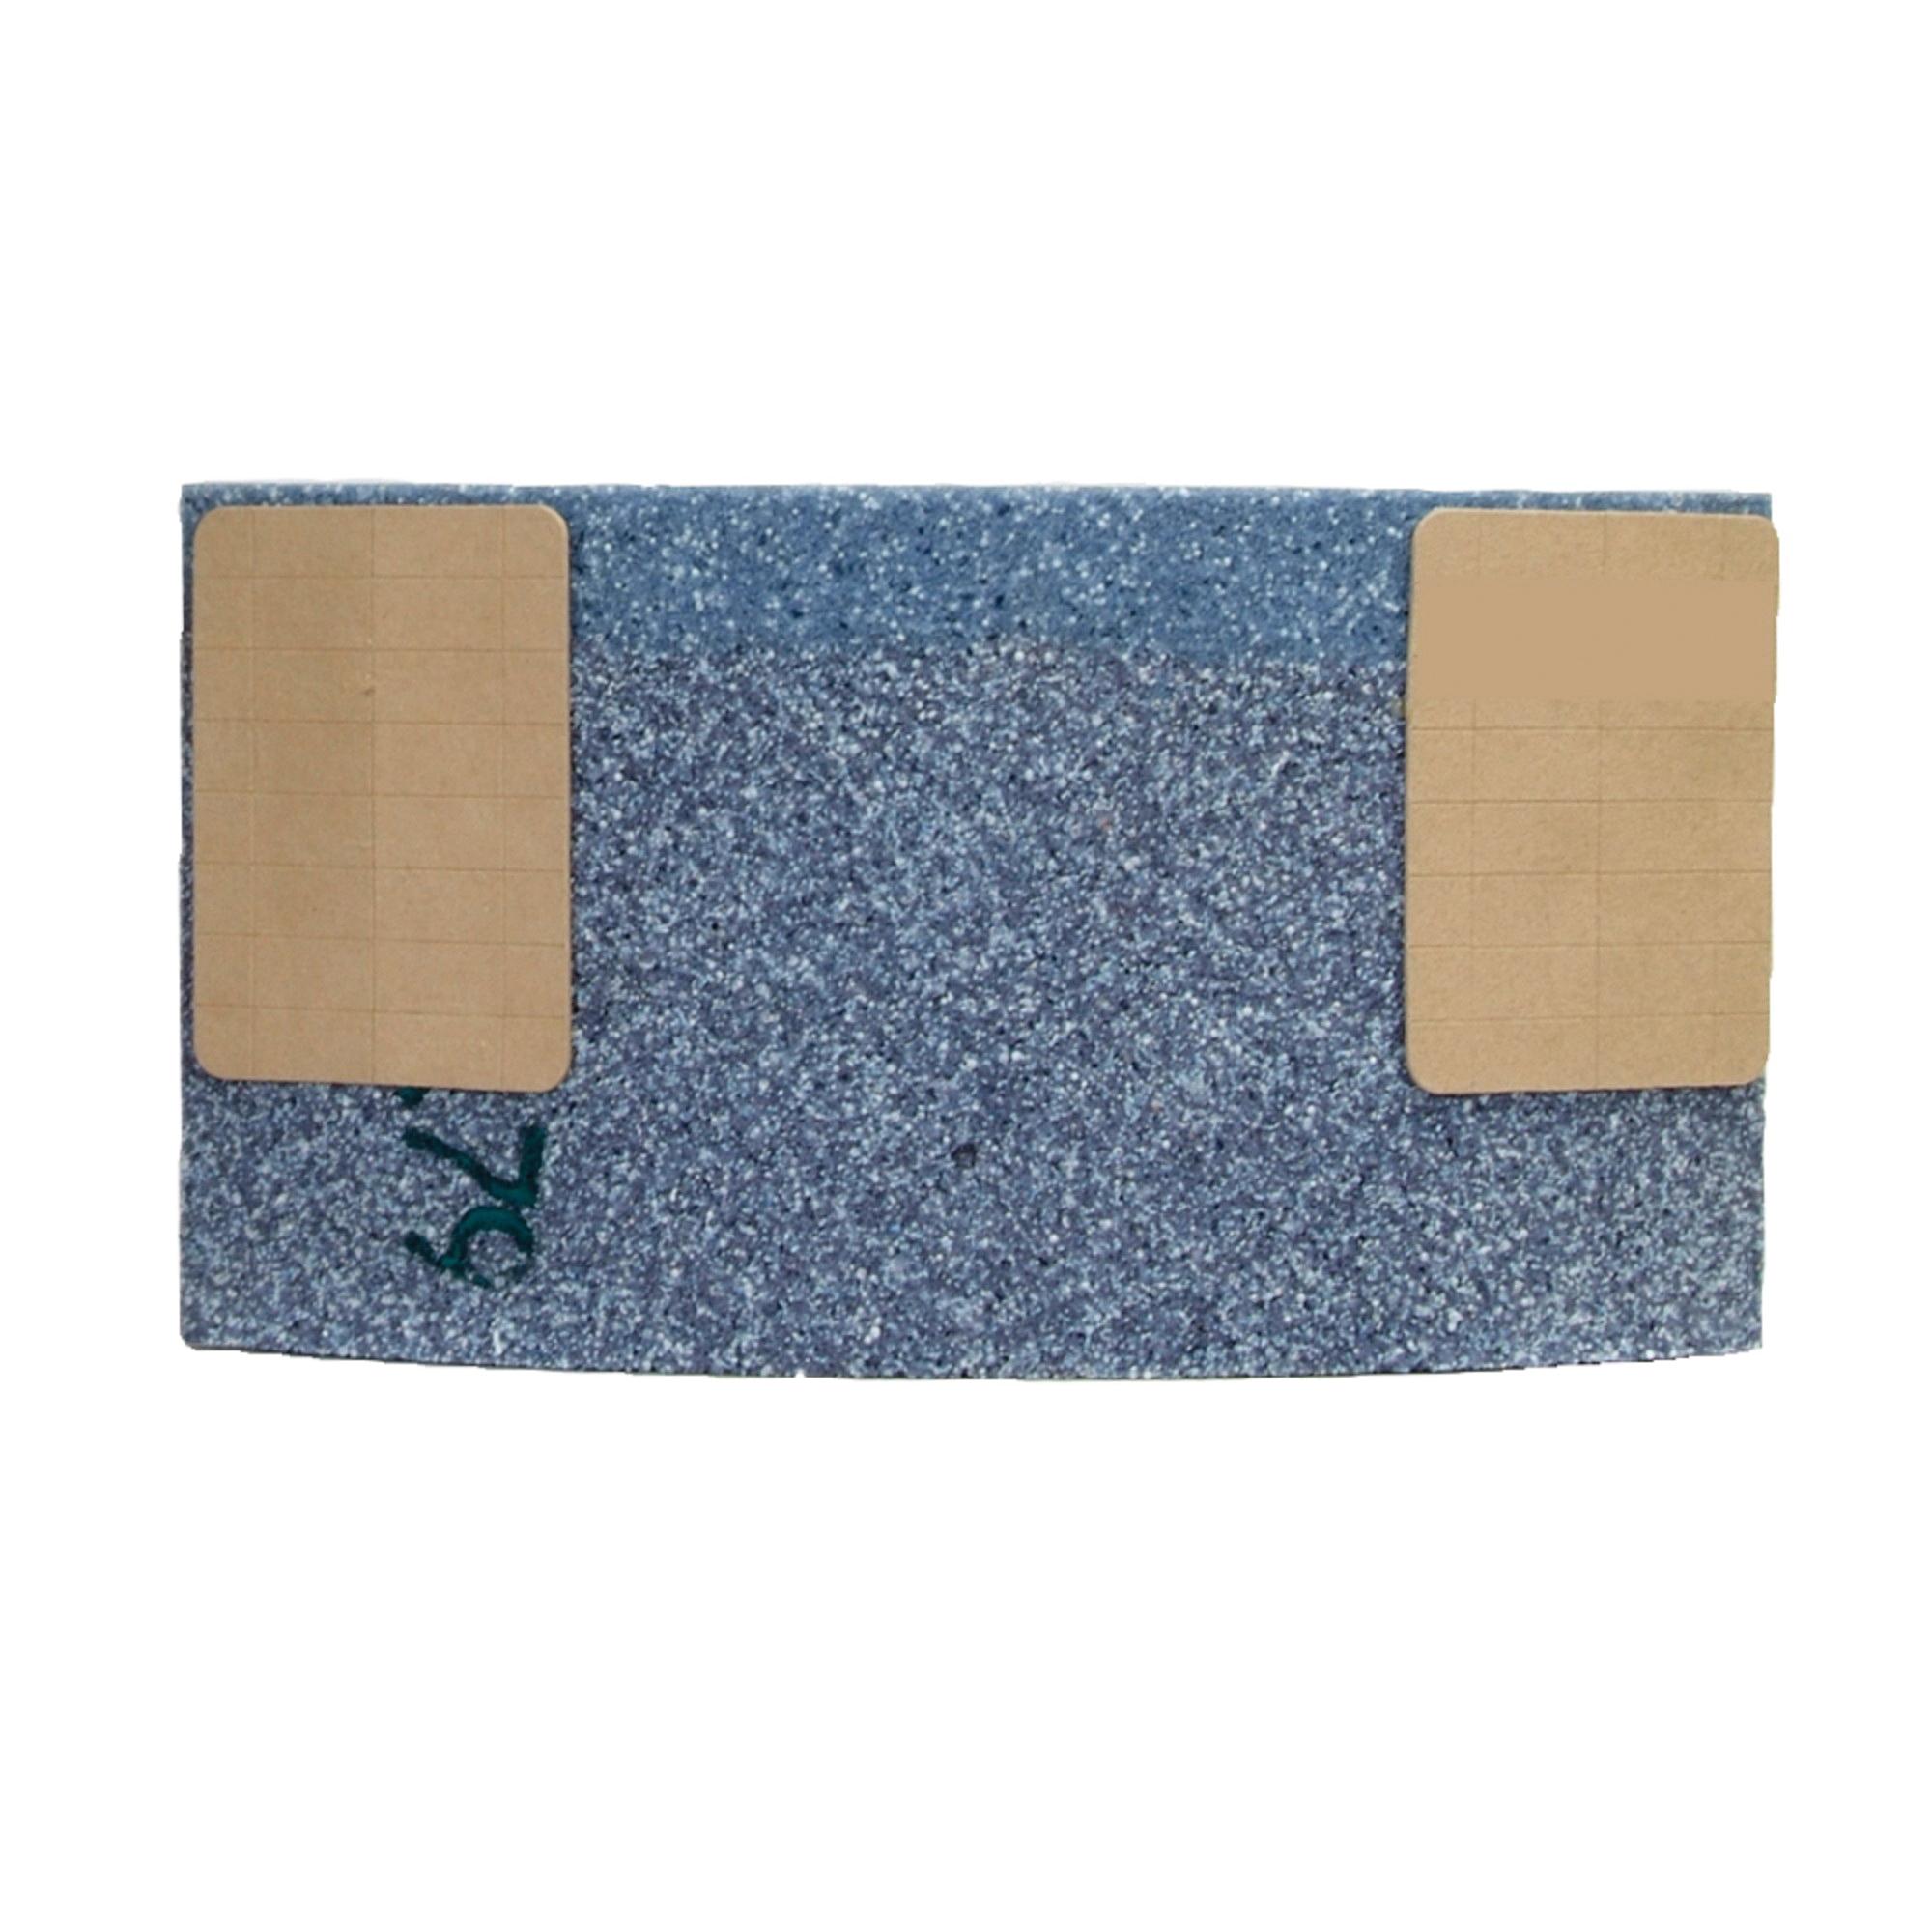 Norton® 61463604522 3SGP Type 31 Surface Grinding Segment, 6 in H x 11-1/4 in W x 2-1/4 in THK, 30 Grit, Ceramic Alumina Abrasive